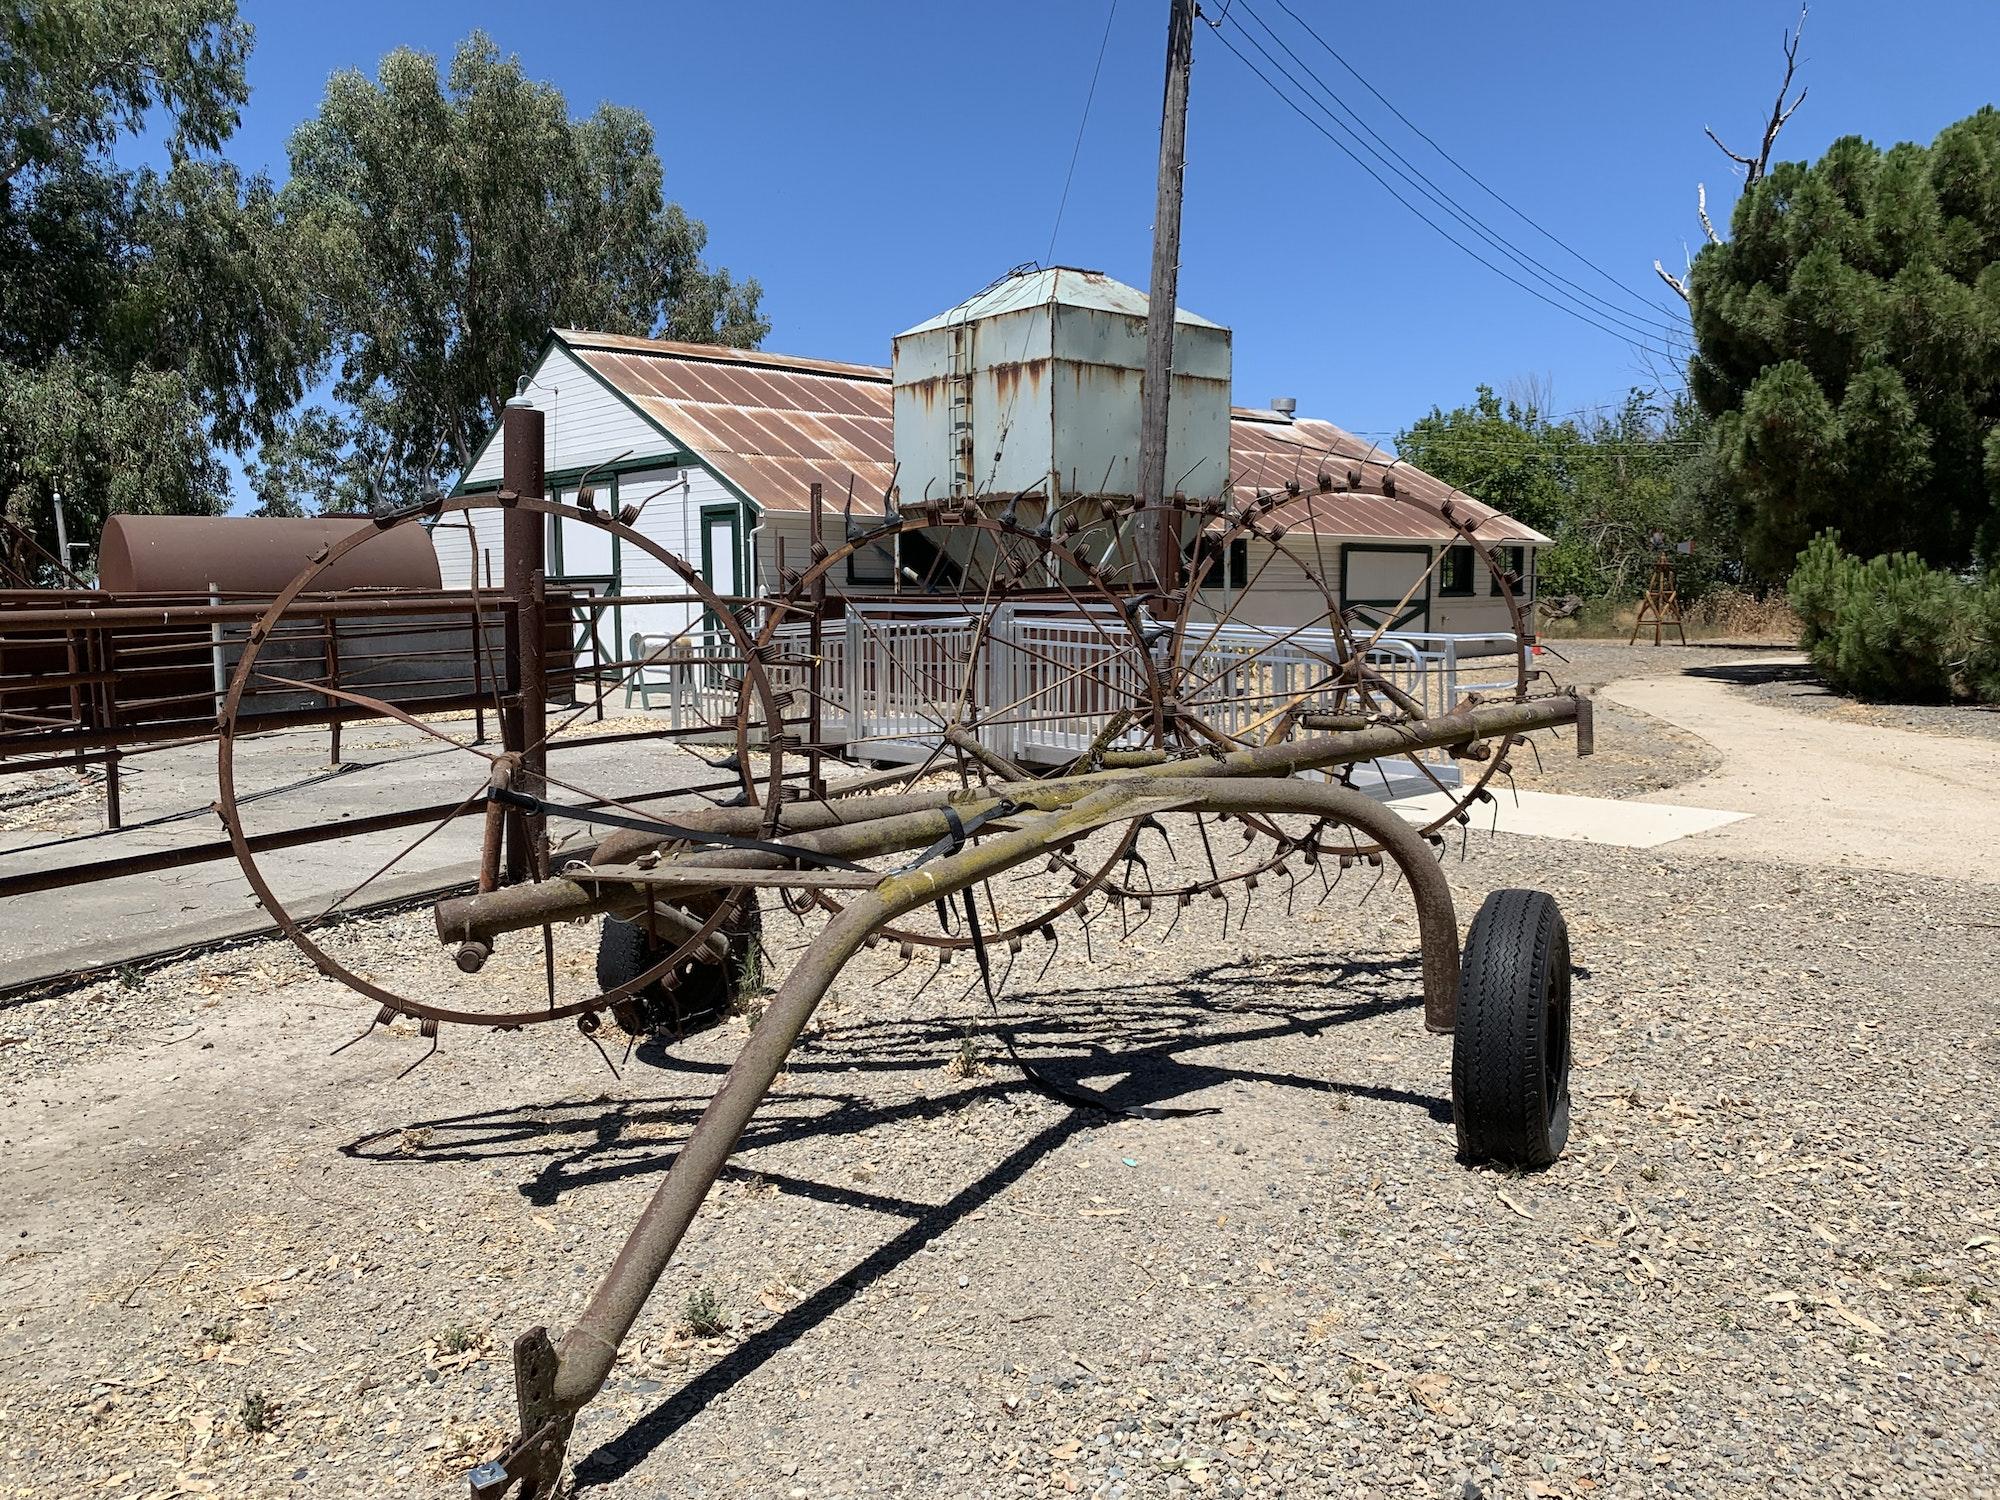 May contain: wagon, transportation, vehicle, and nature